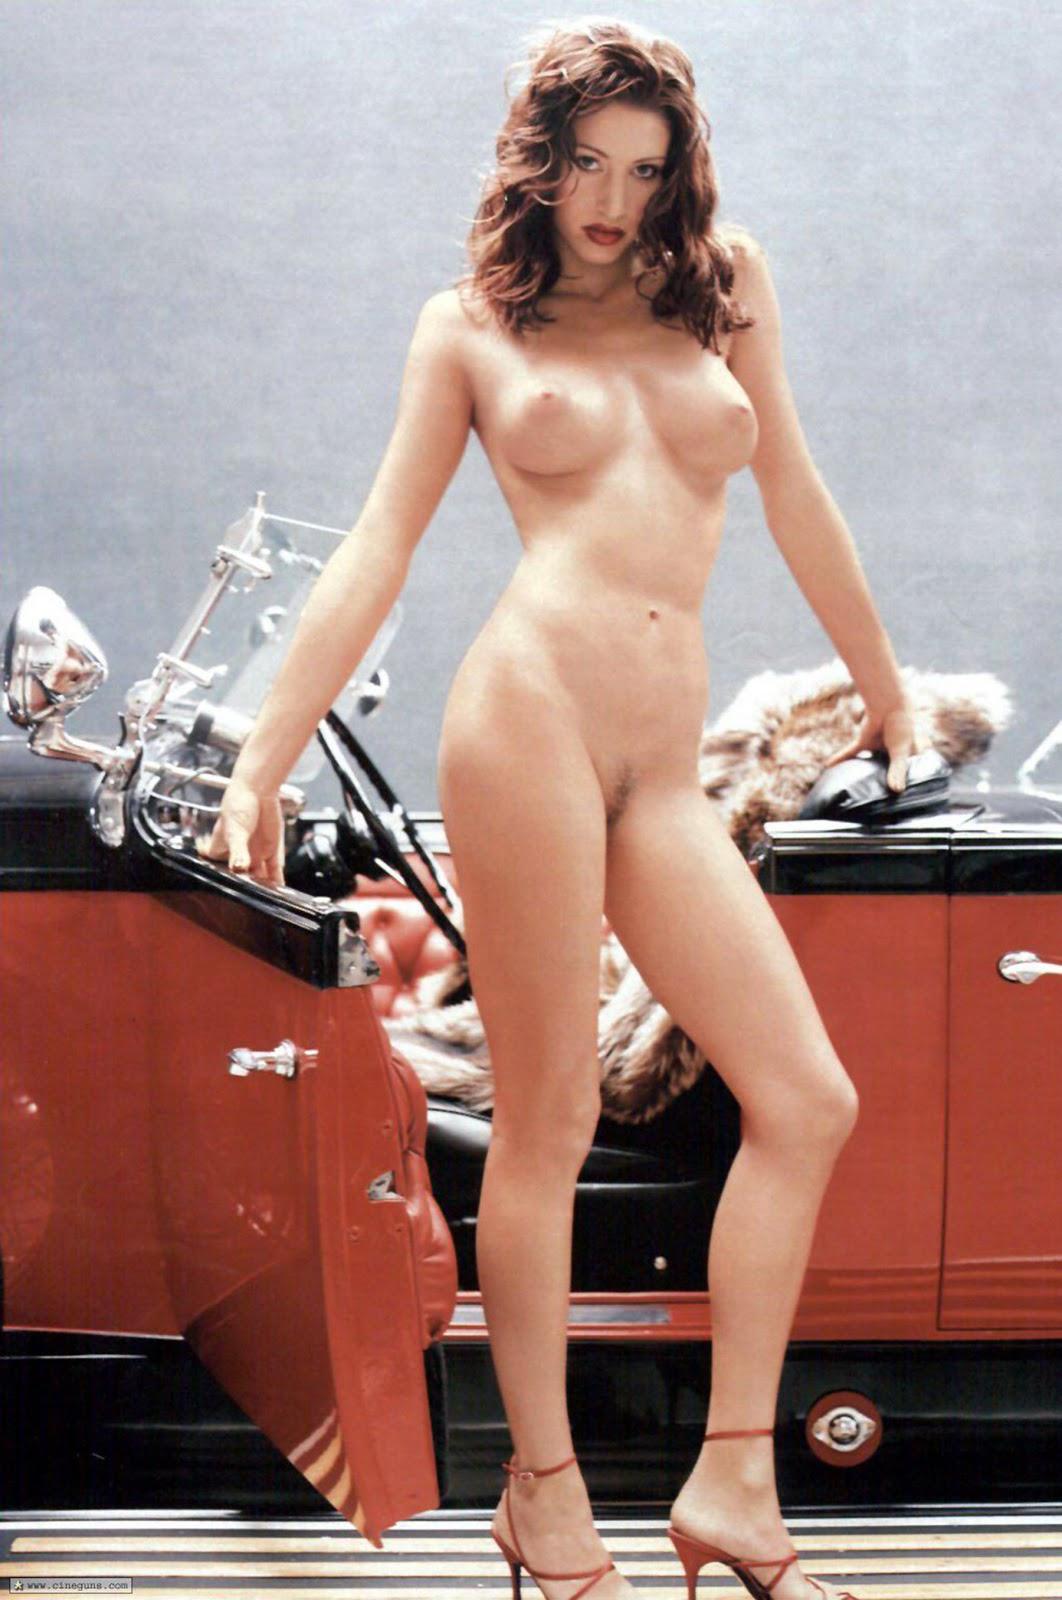 nude-pics-of-shannon-elizabeth